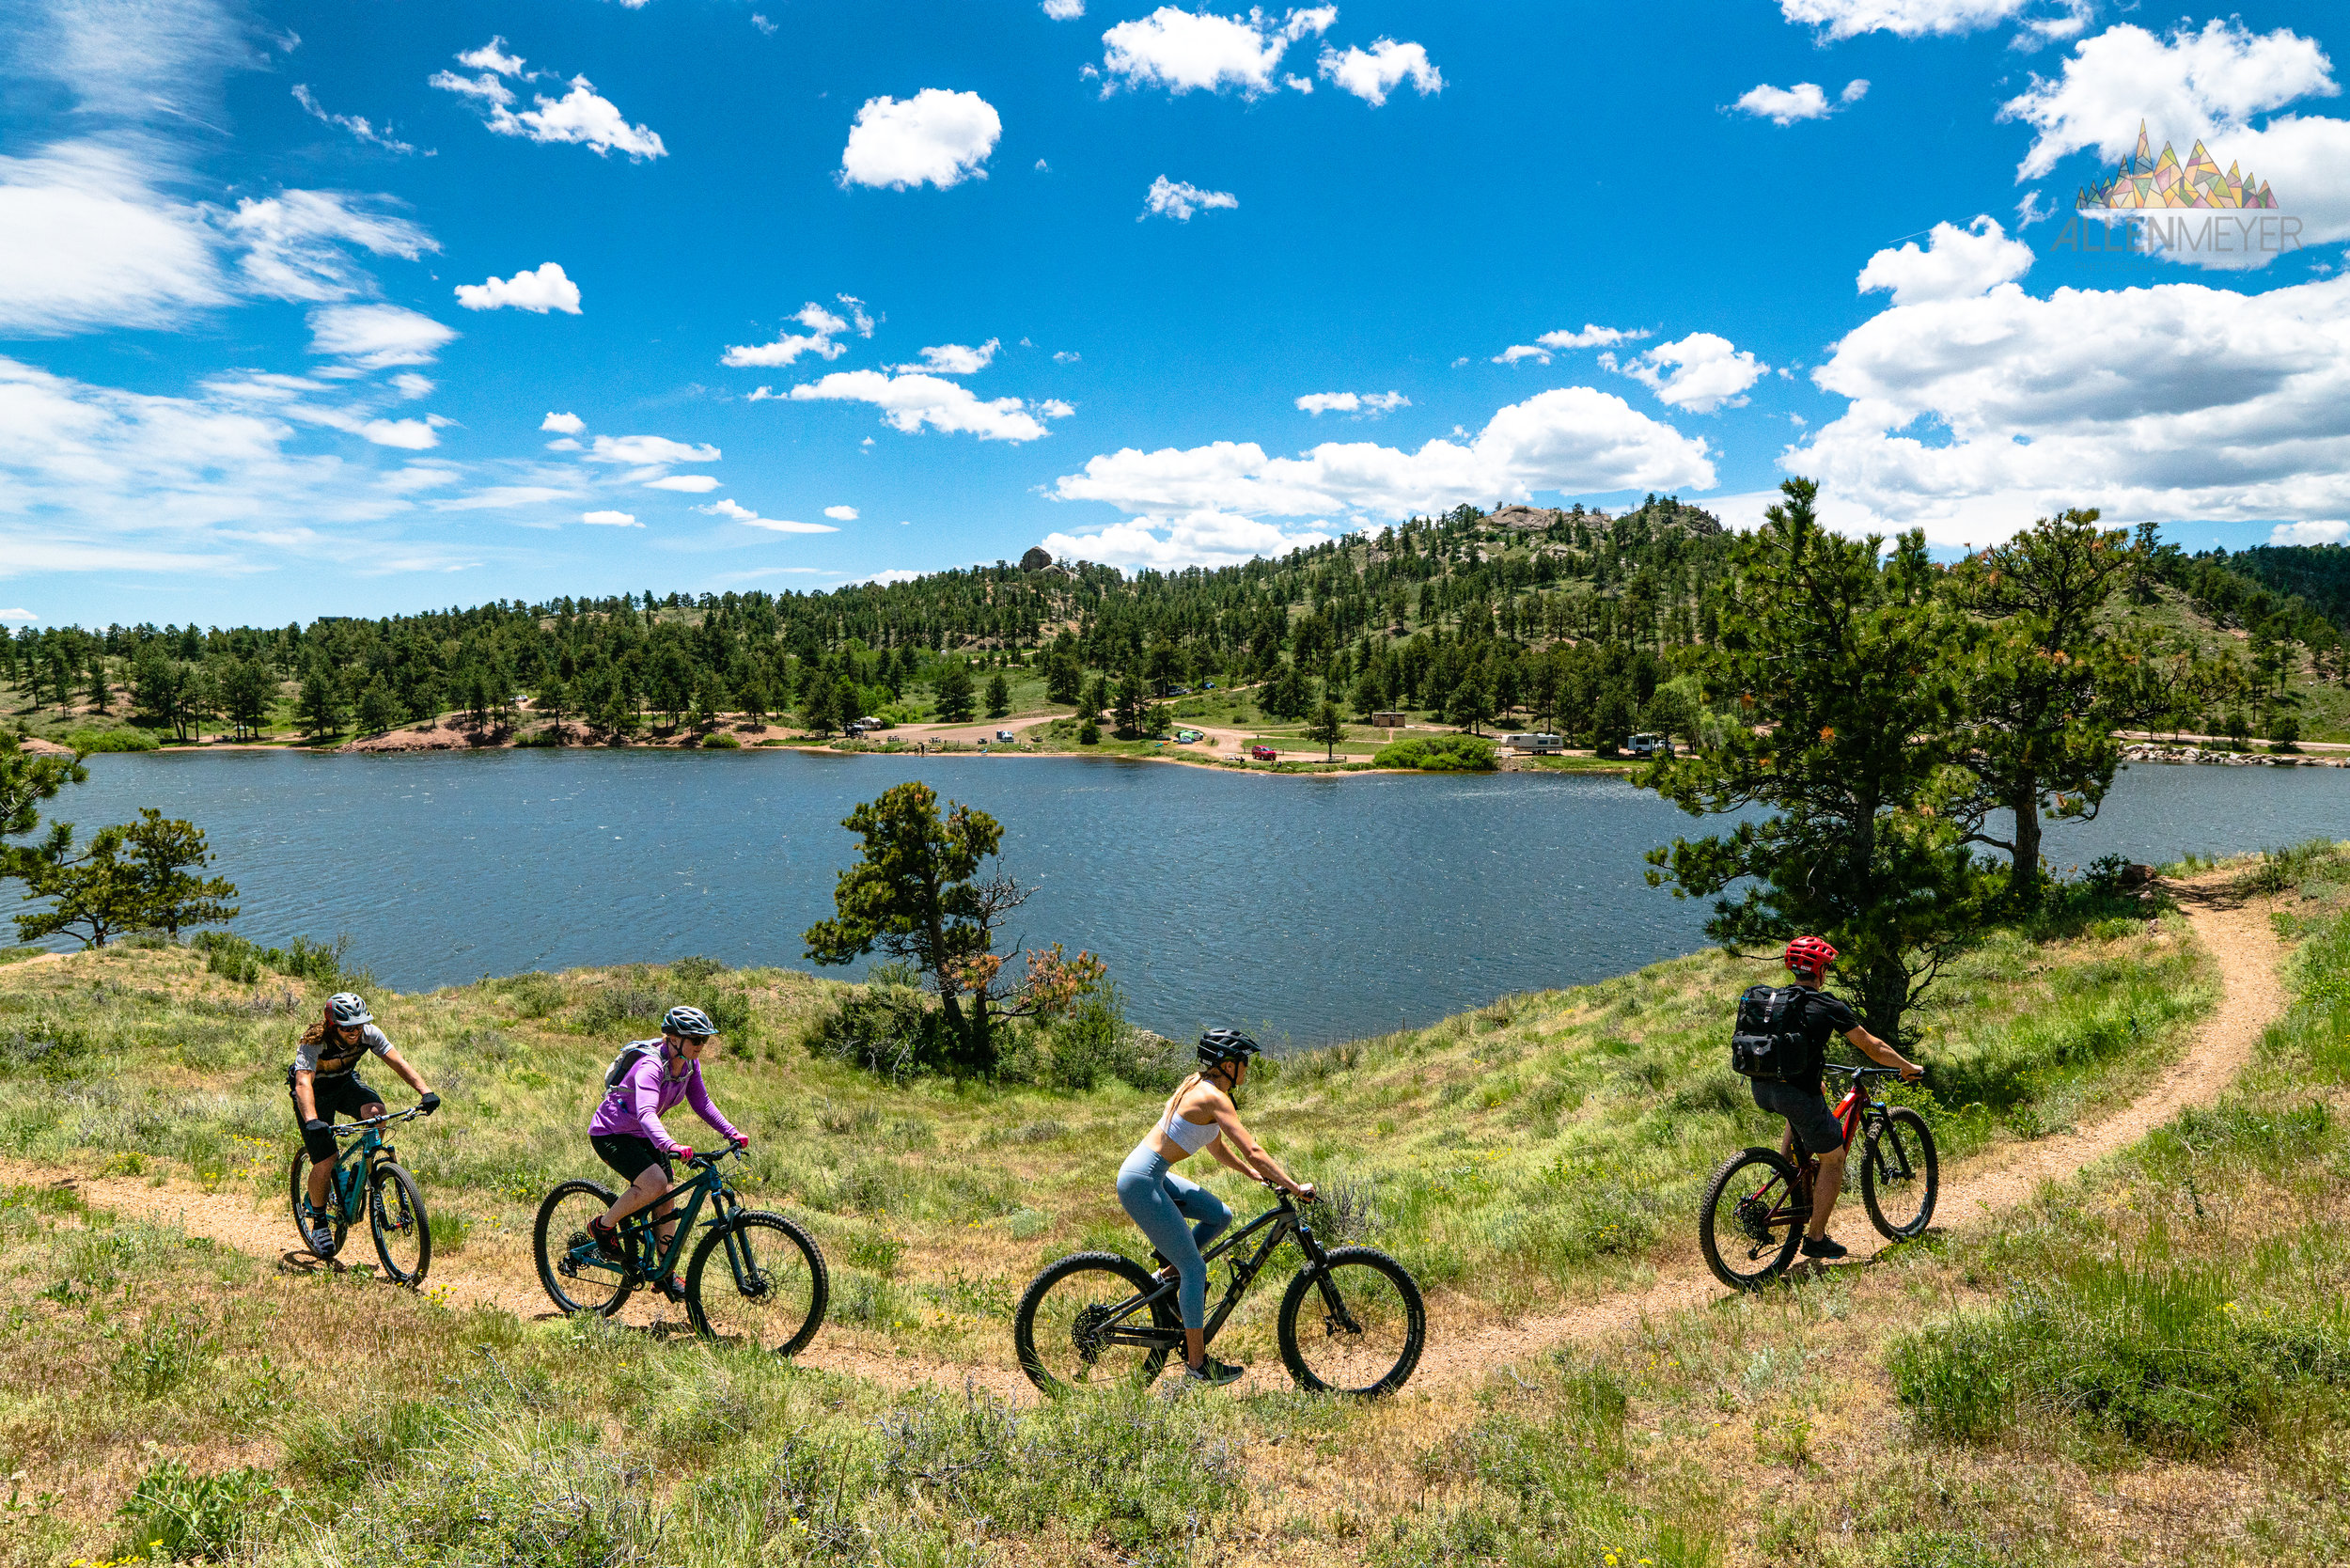 Outdoor Adventures In Cheyenne, Wyoming; Photography by Allen Meyer-05666.jpg